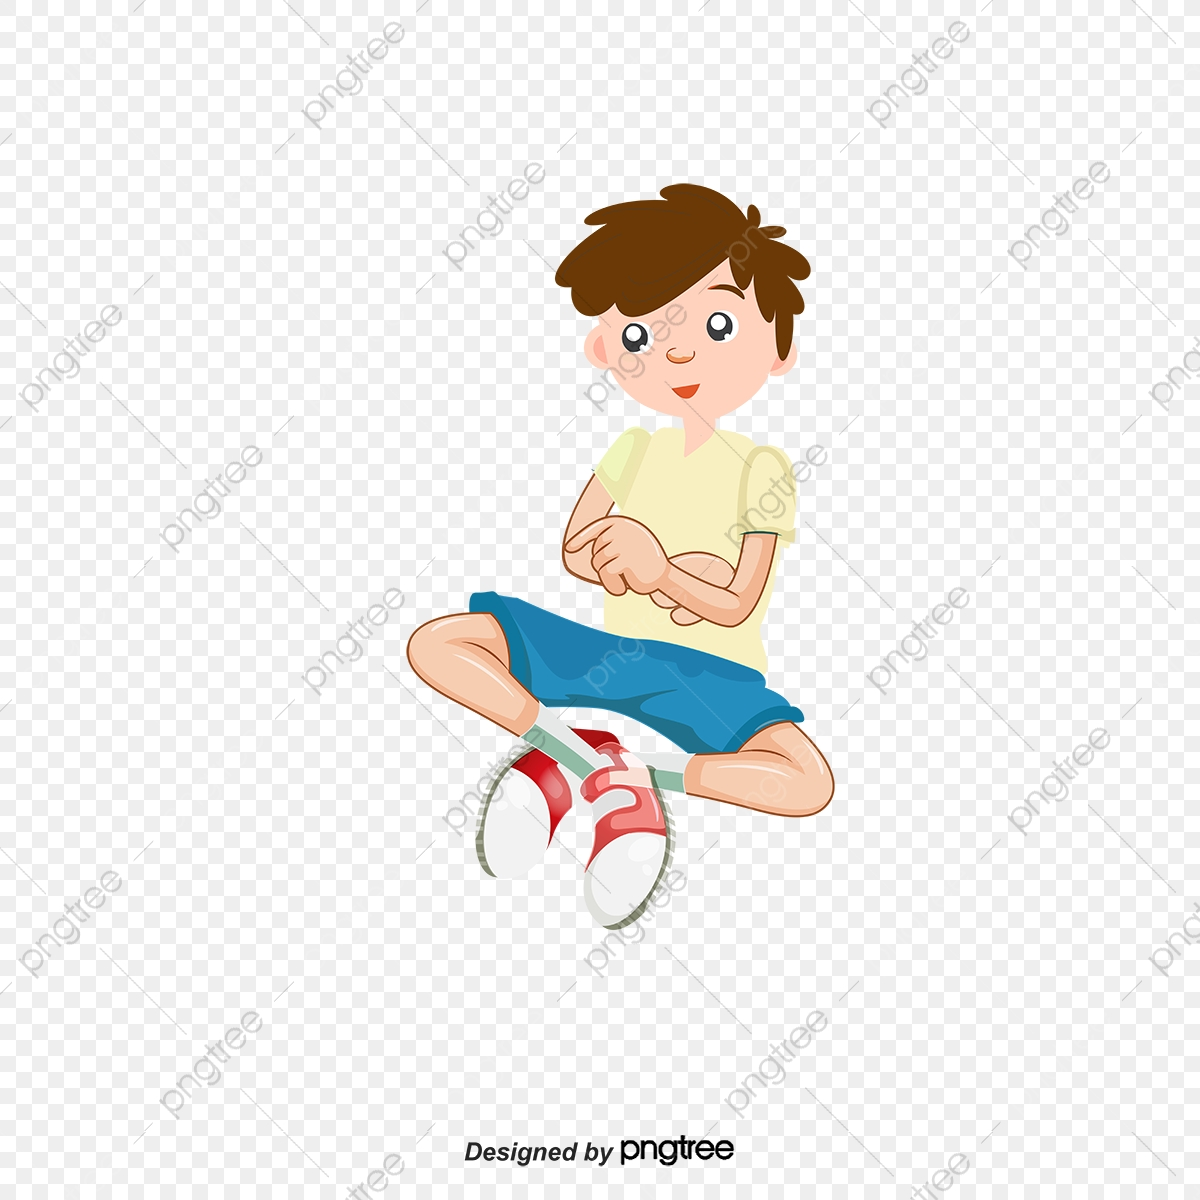 Sit on the little. Floor clipart cute